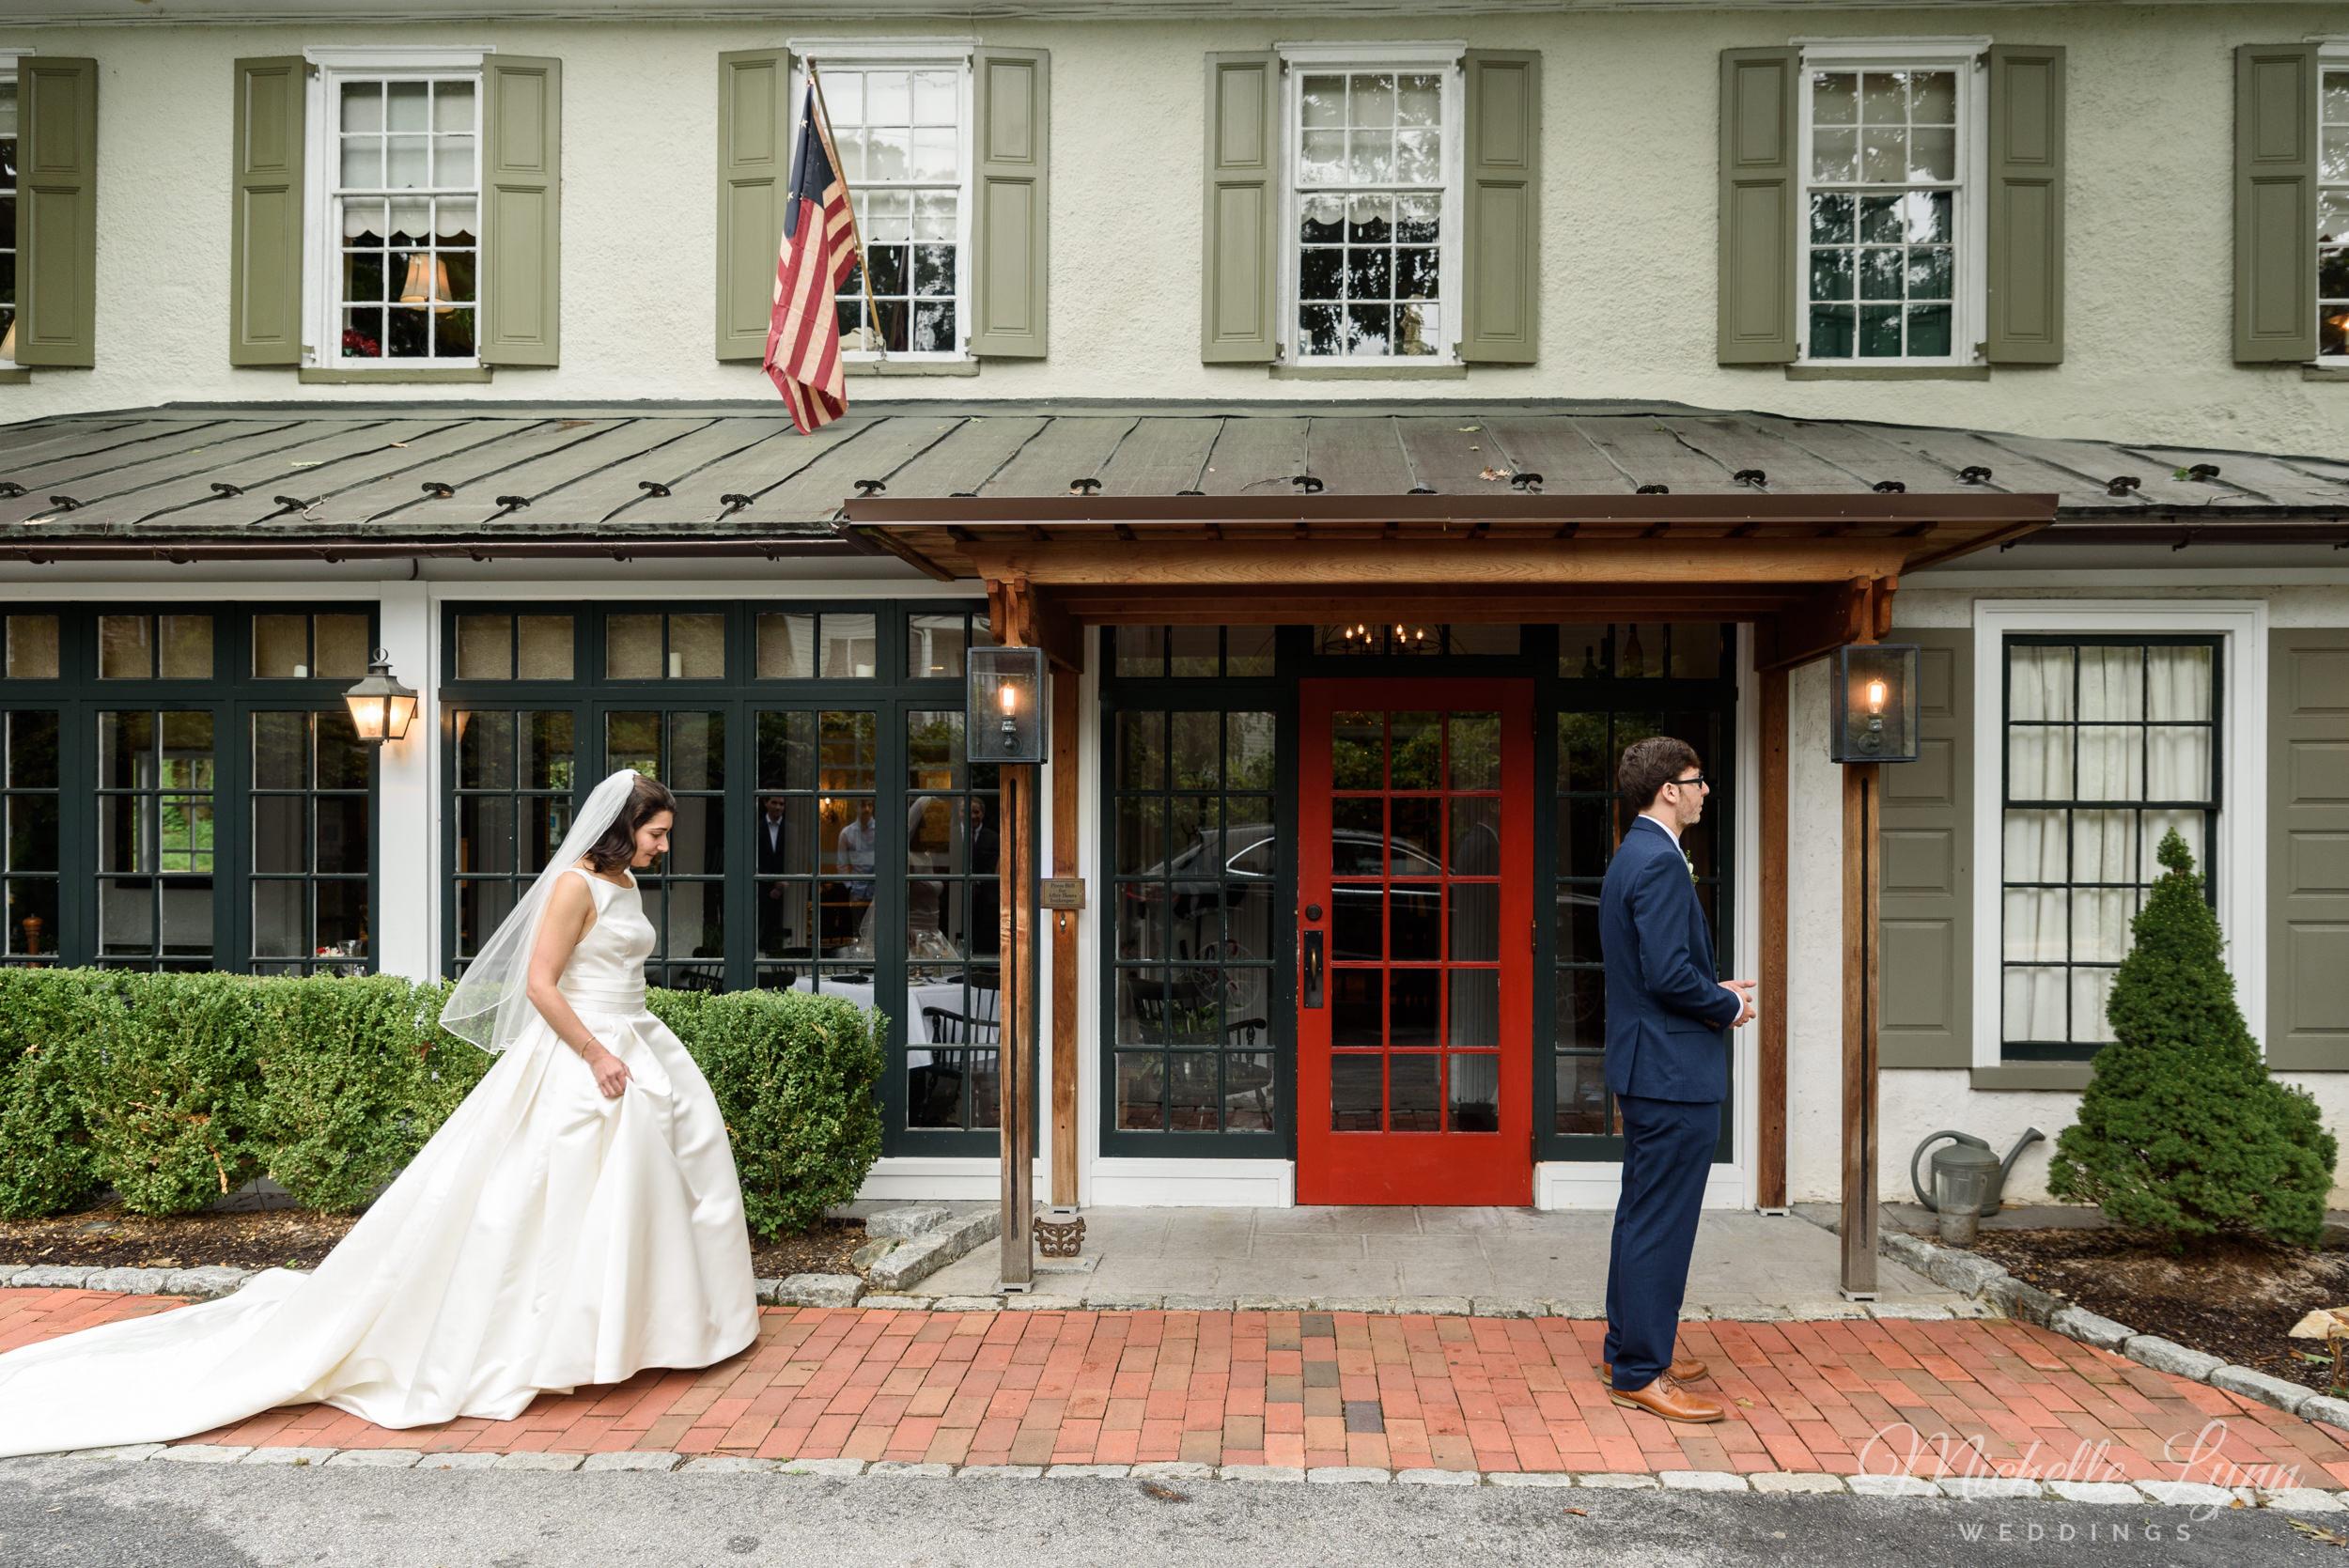 mlw-general-warren-malvern-wedding-photographer-7.jpg